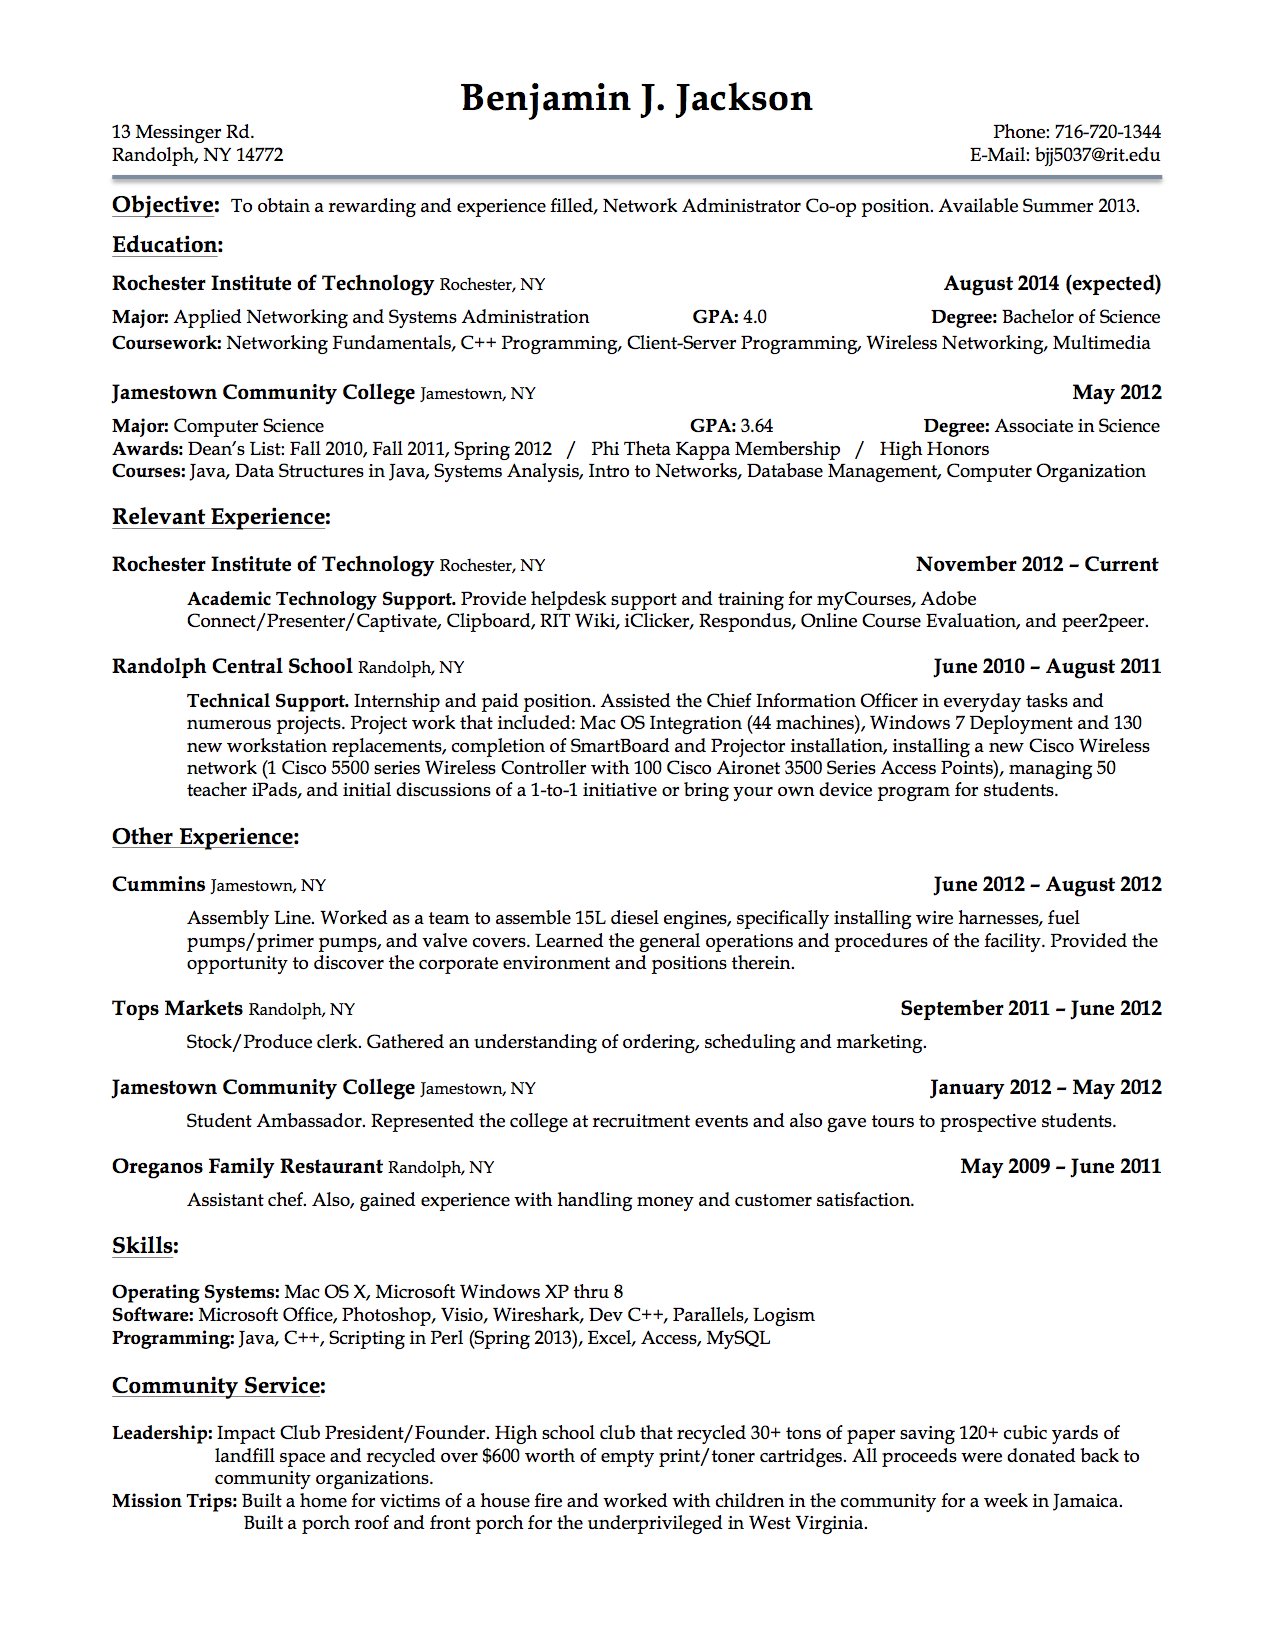 CV en Anglais Cv anglais, Exemple cv, Modèle cv gratuit